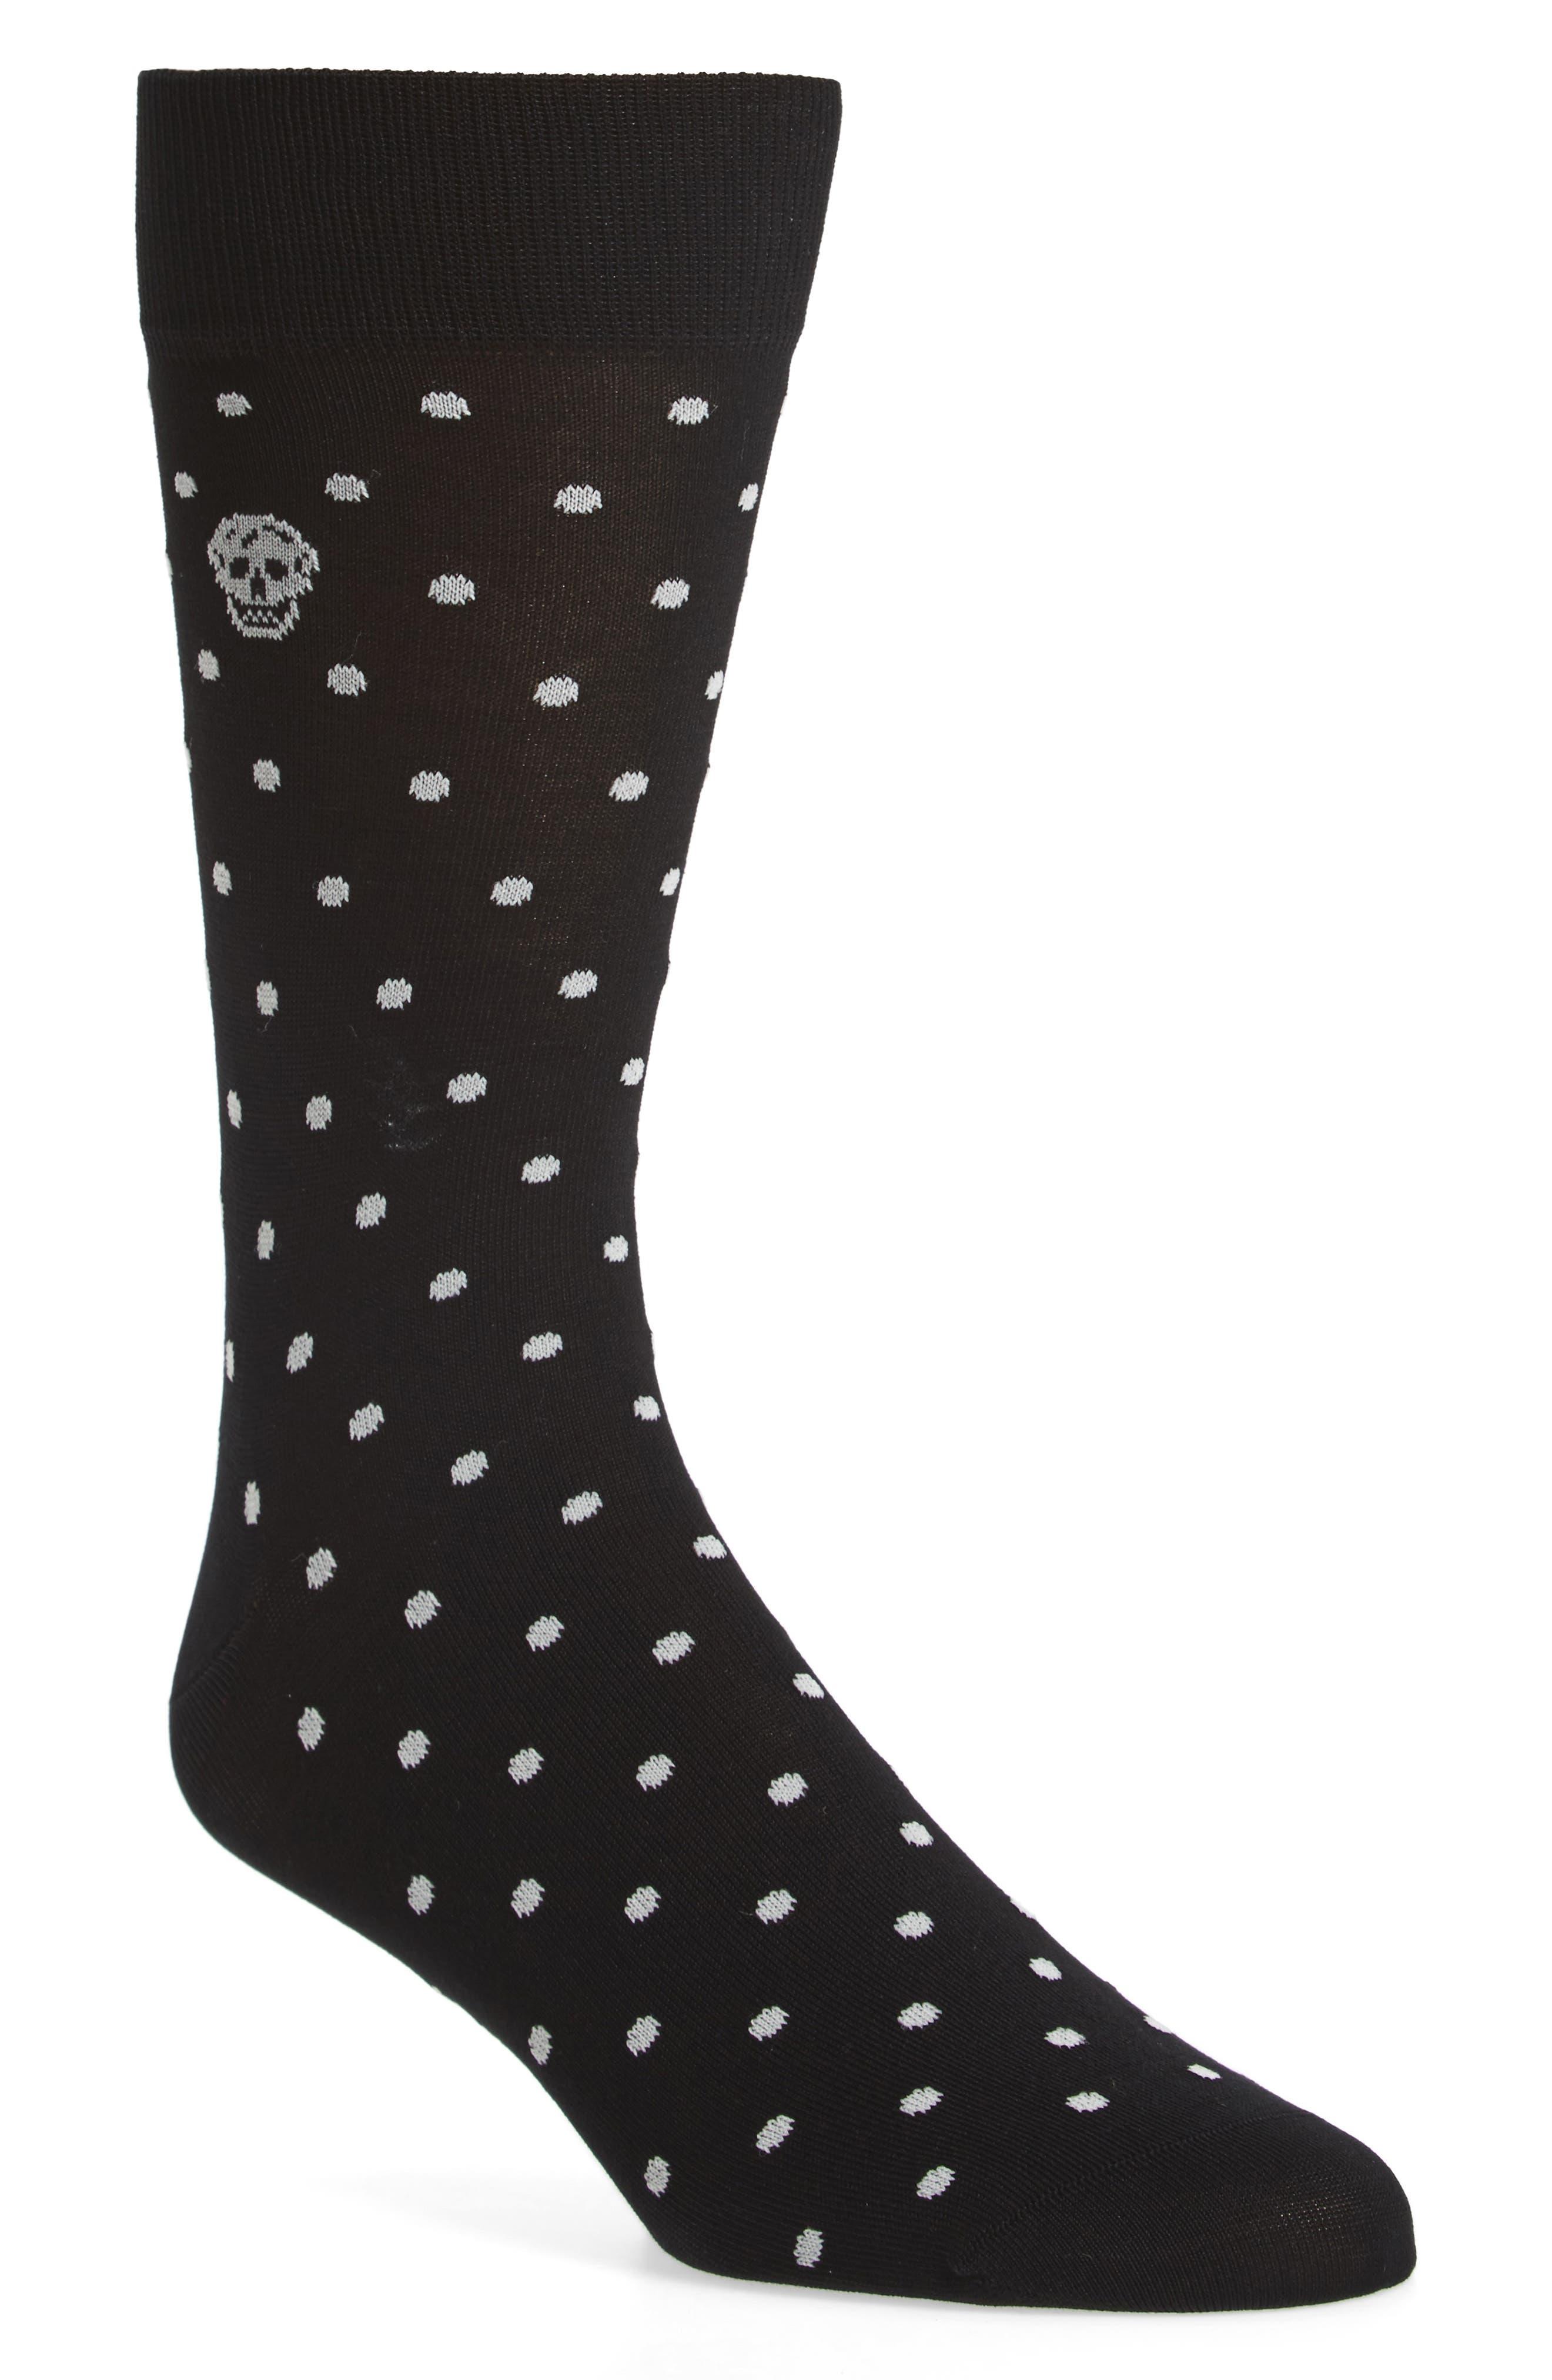 Cotton Blend Polka Dot Socks,                         Main,                         color, 001